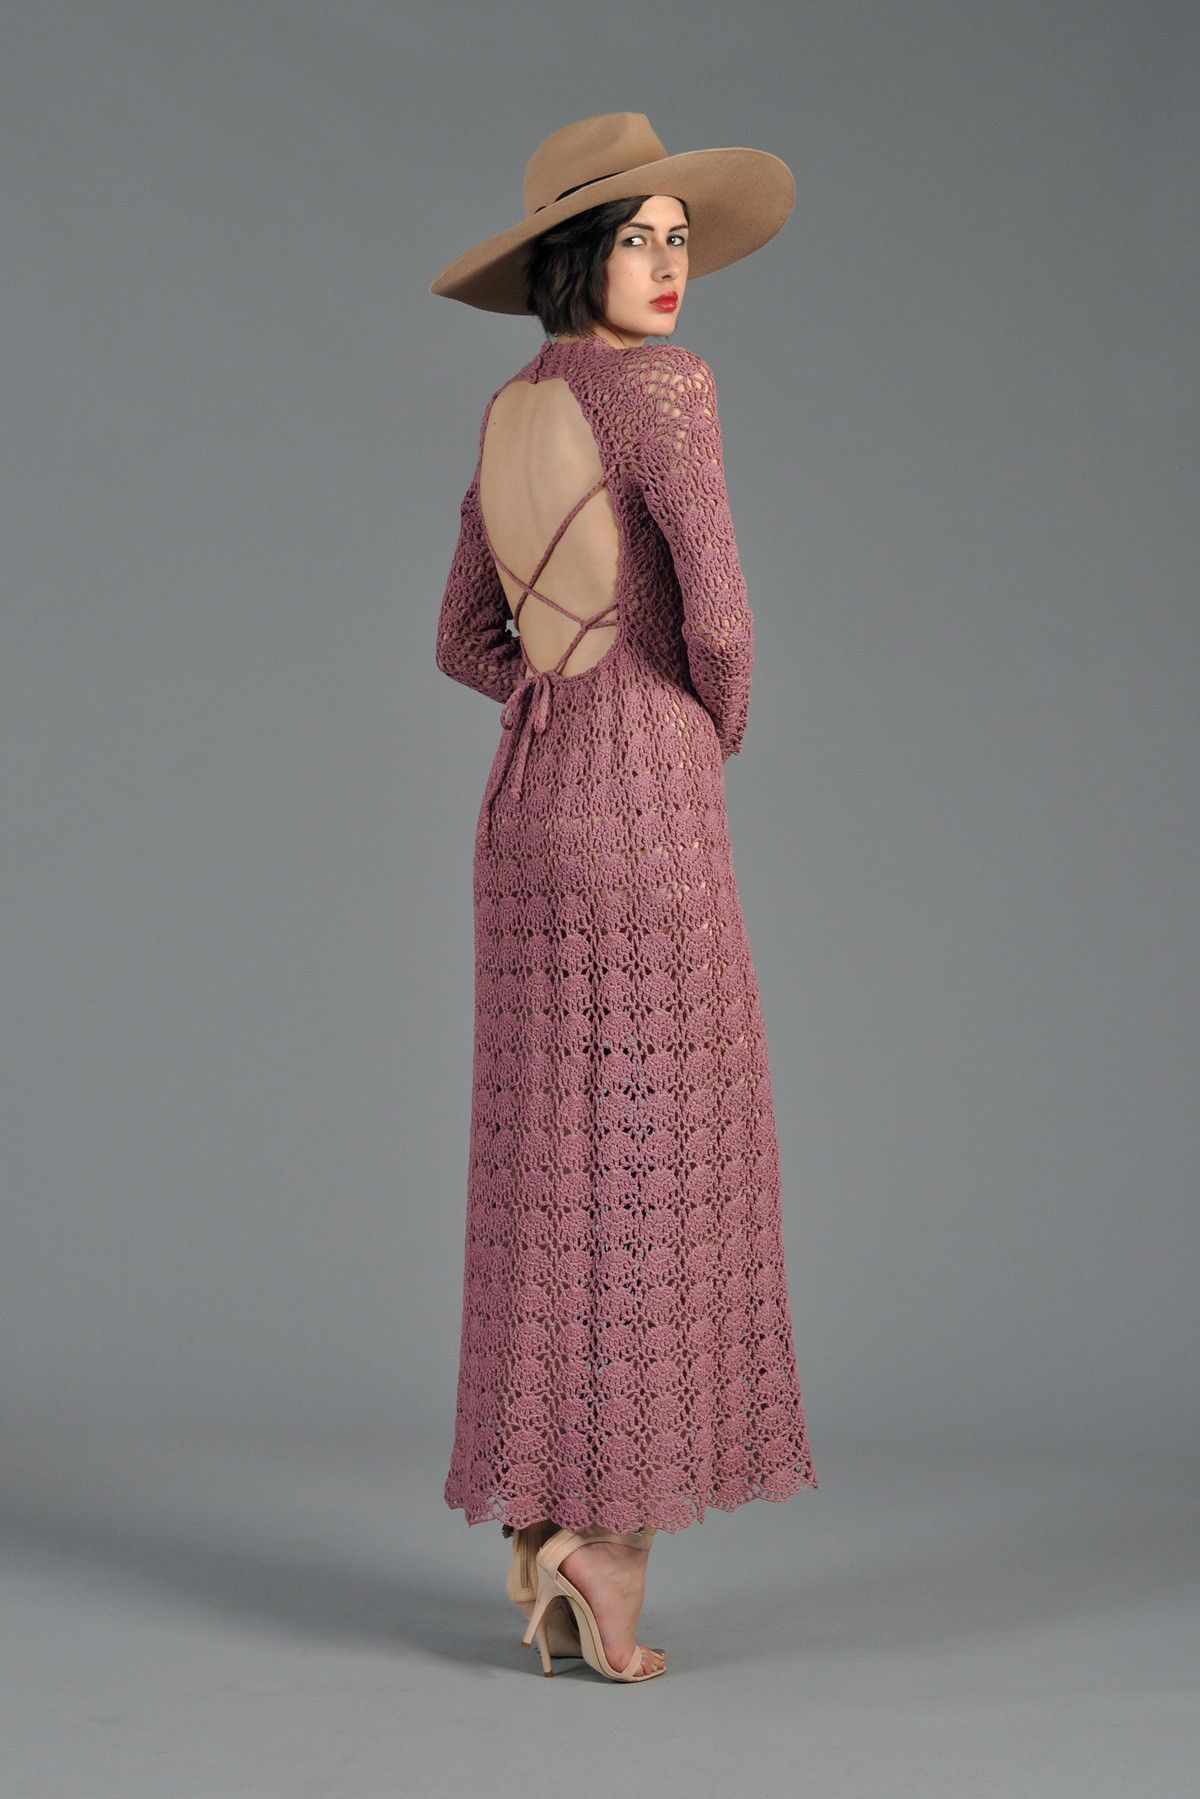 bustown-modern-vintage-rose-crochet-keyhole-back-maxi-dress-005.jpg (1200×1799)